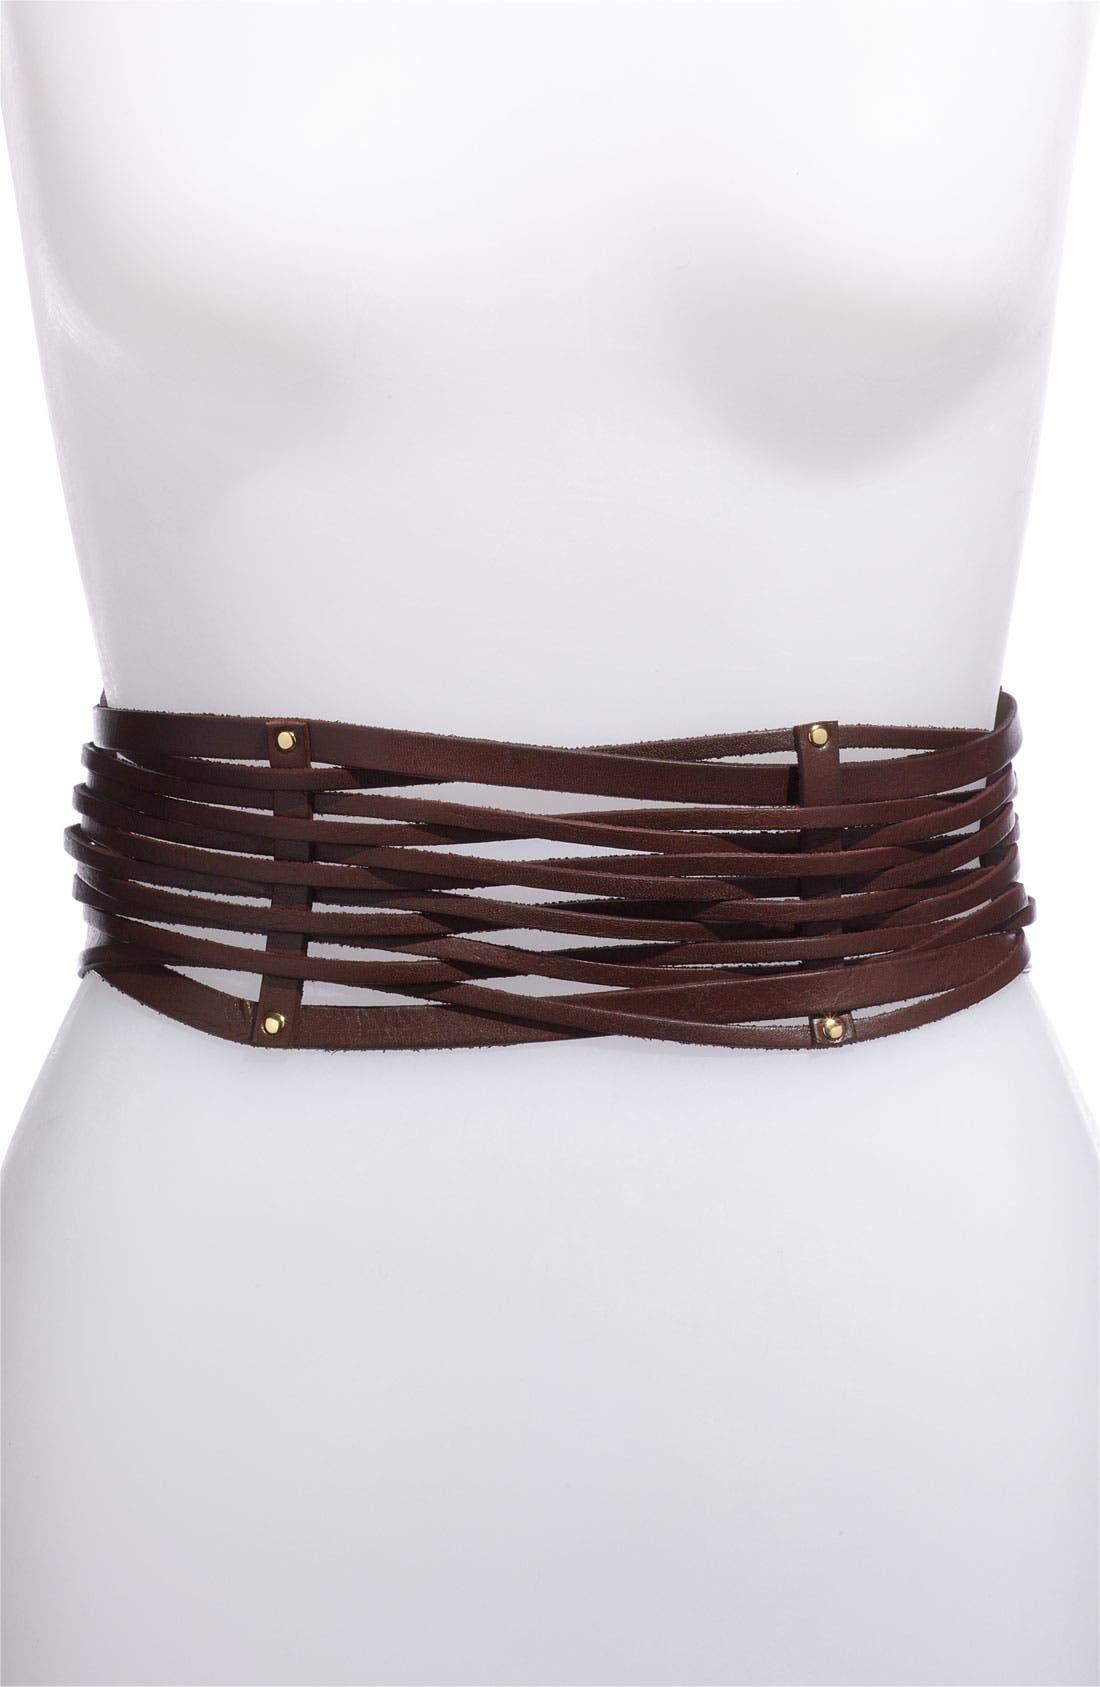 Alternate Image 1 Selected - Vince Camuto Leather Strand Stretch Belt